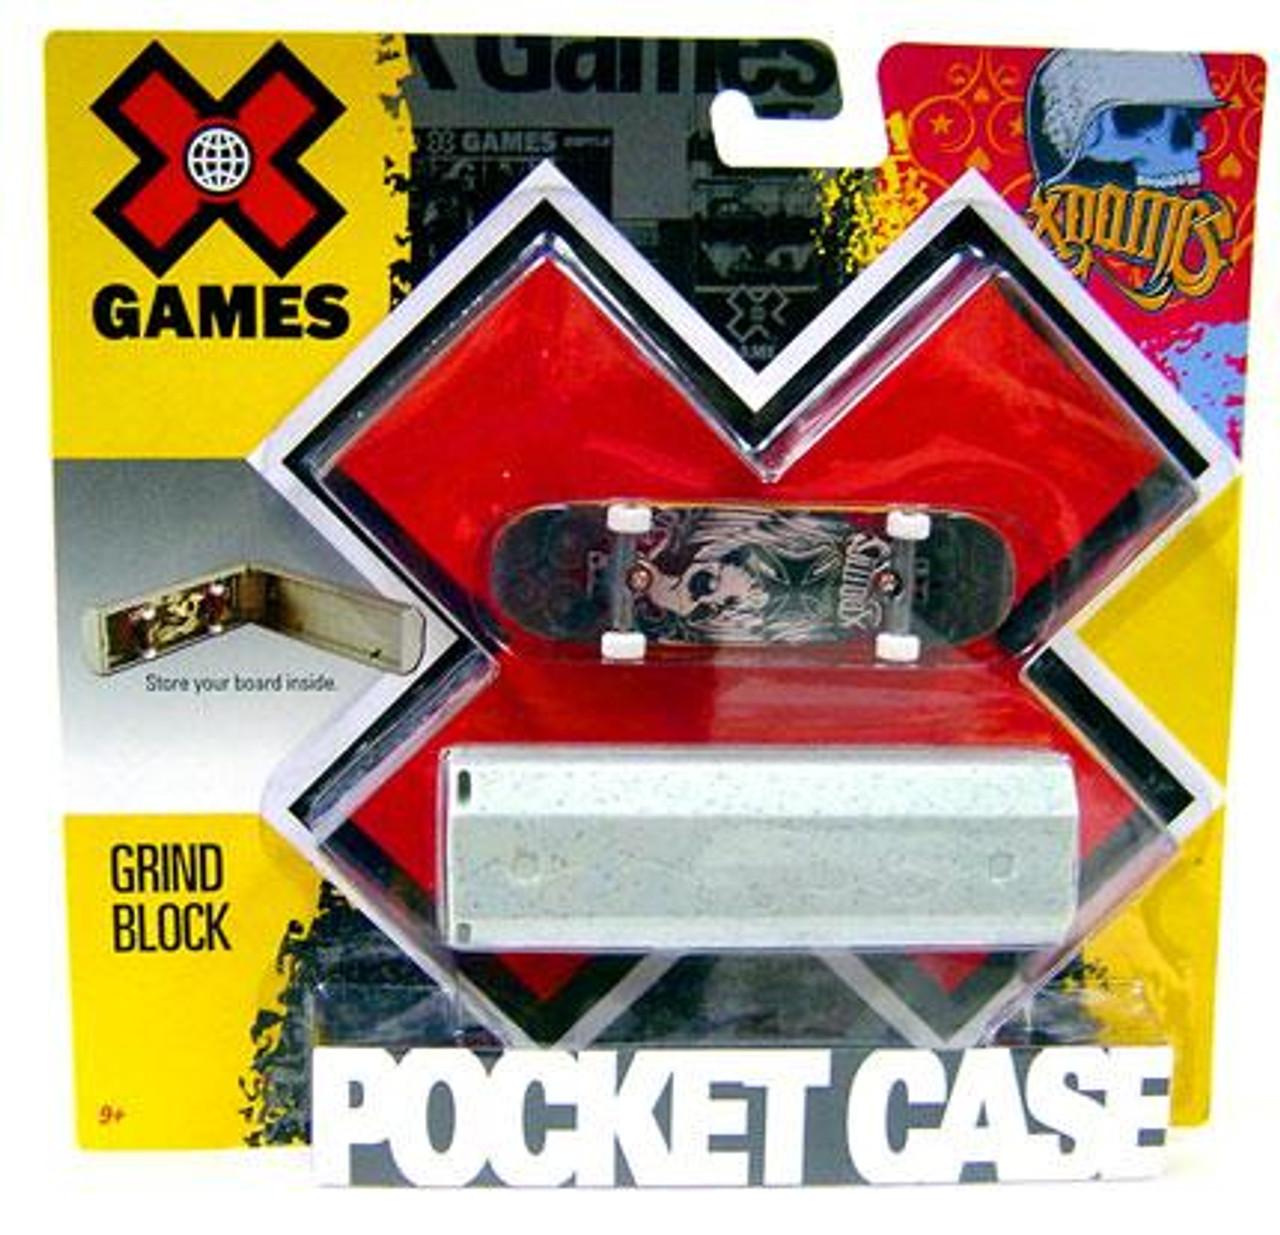 X Games Extreme Sports Grind Block Mini Skateboard Pocket Case